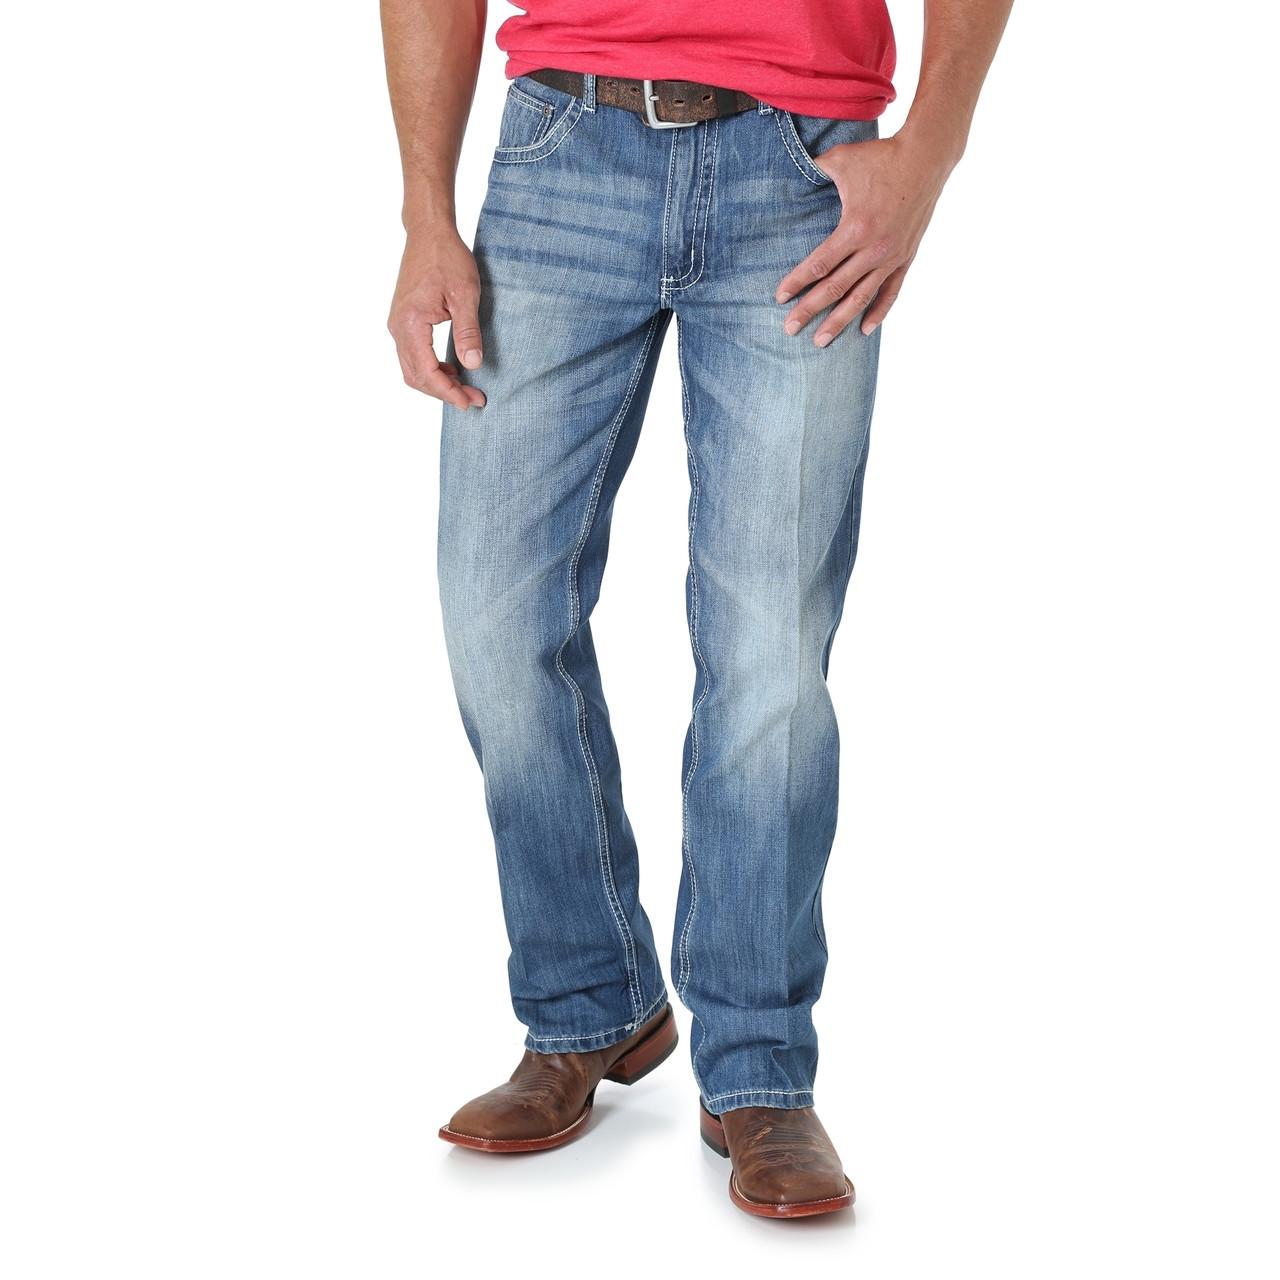 Wrangler Mens Size Tall 20x Vintage Bootcut Jean